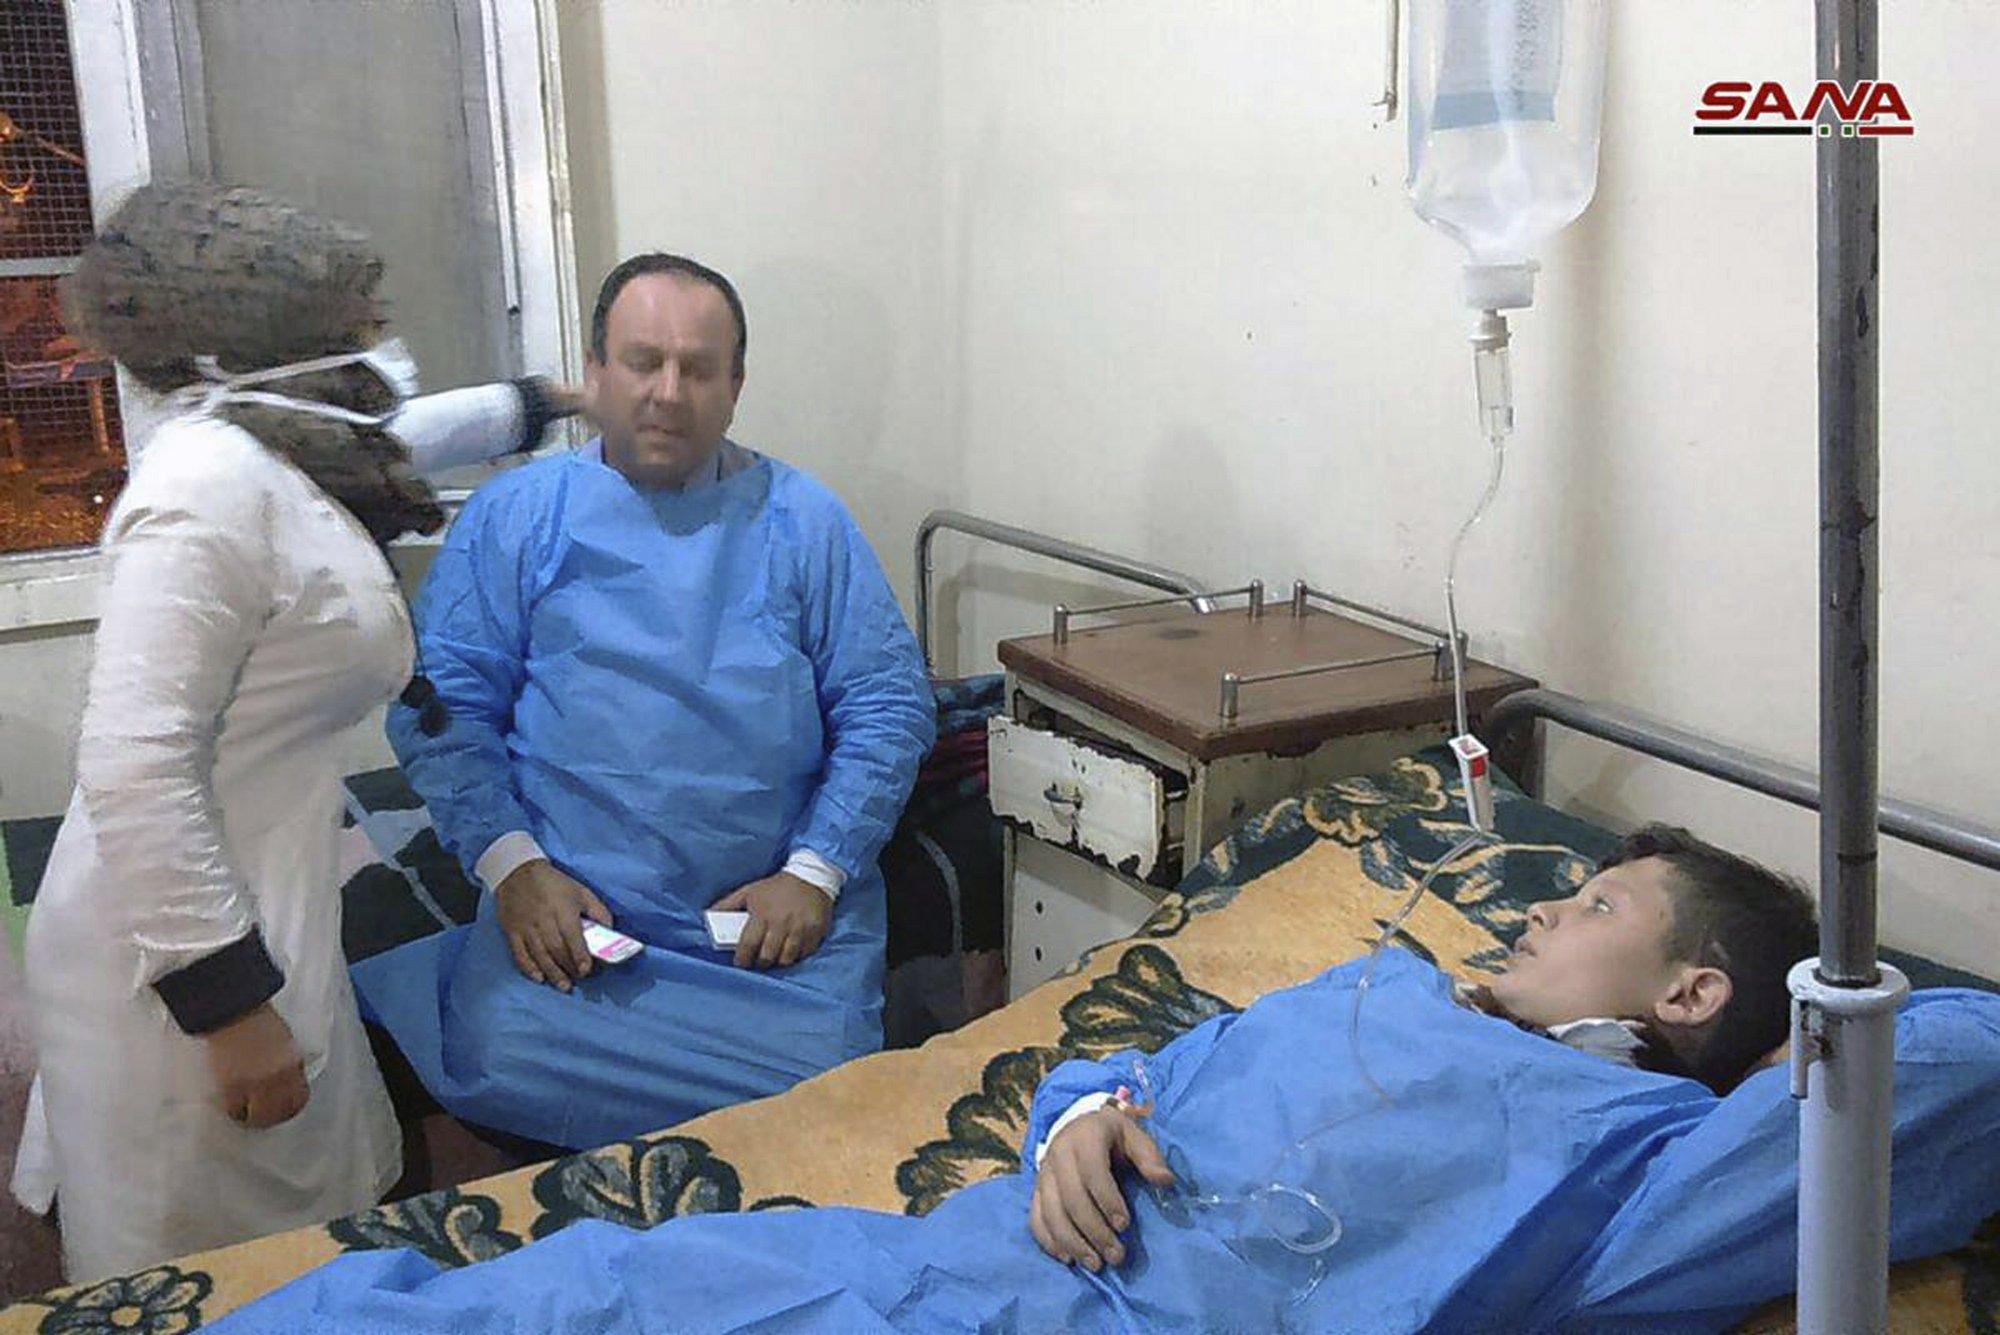 Syria state TV: 50 injured in rebel poison gas attack